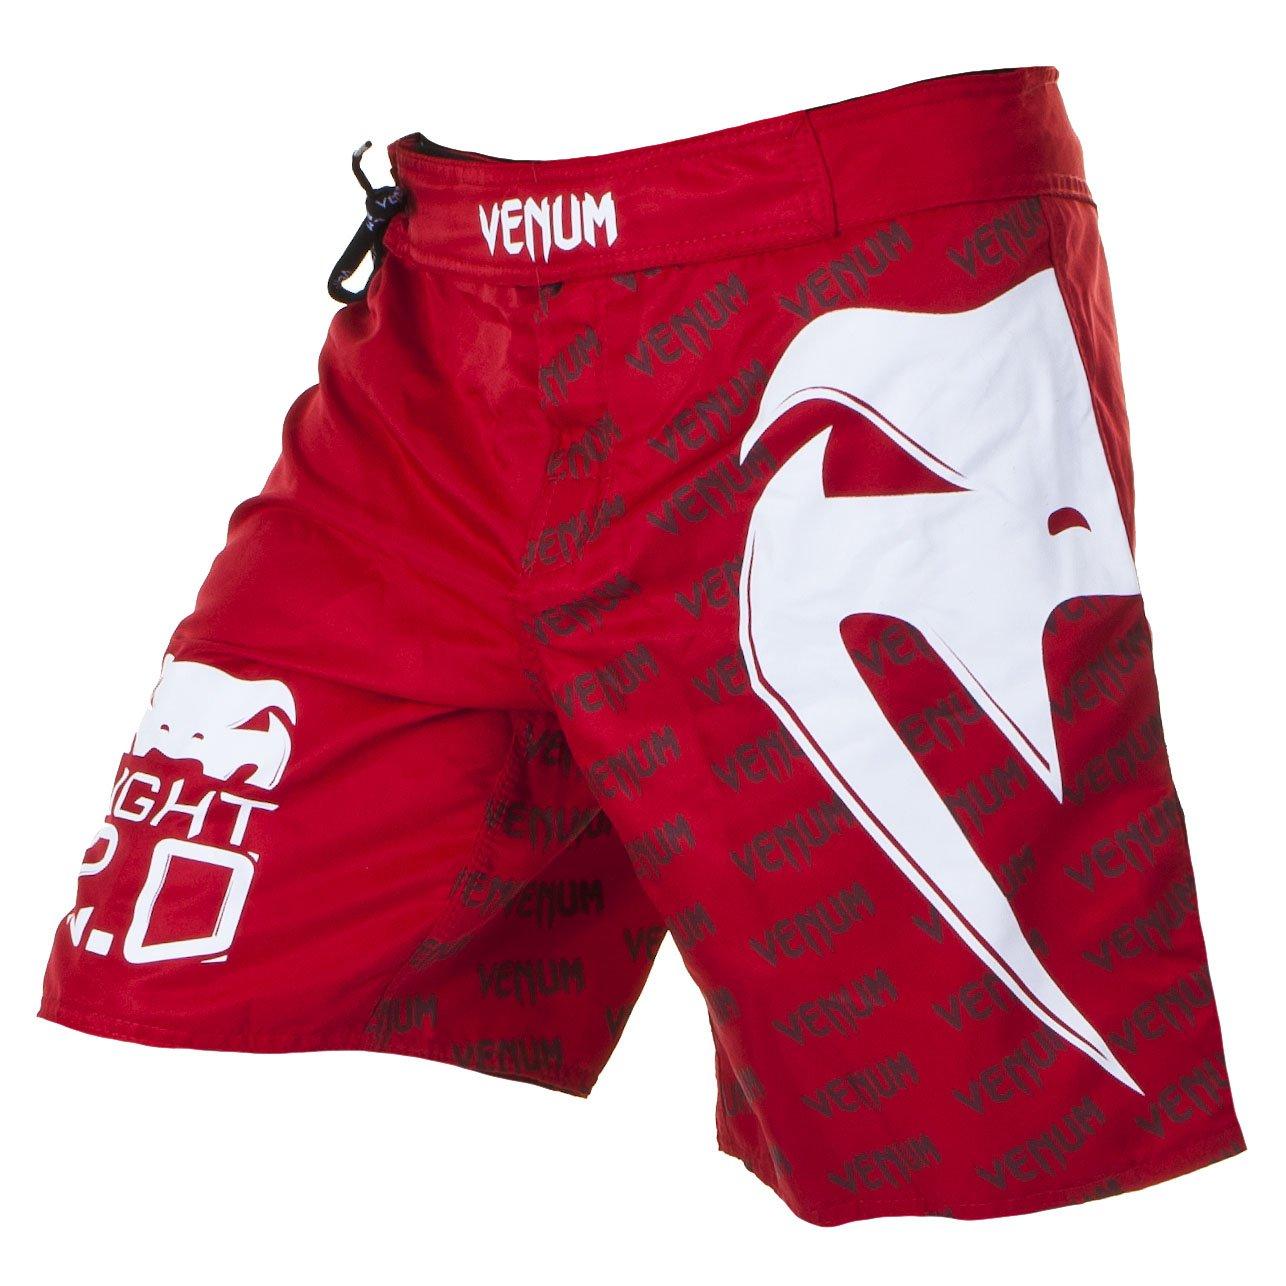 Venum 0630-L Light 2.0 Fight Shorts VENUQ US-VENUM-0630-L-Parent